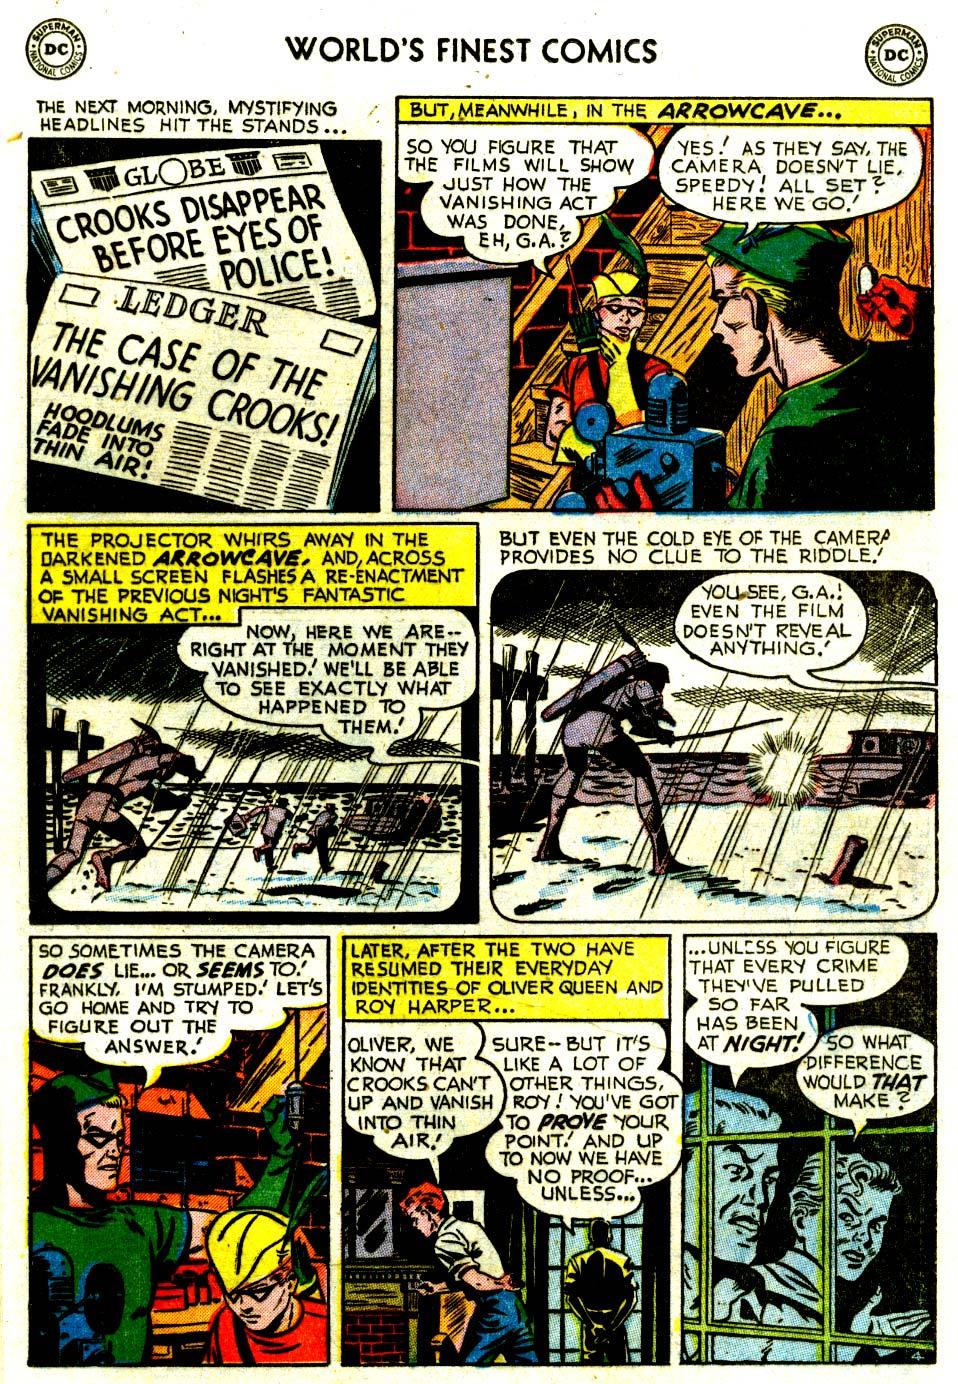 Read online World's Finest Comics comic -  Issue #68 - 30